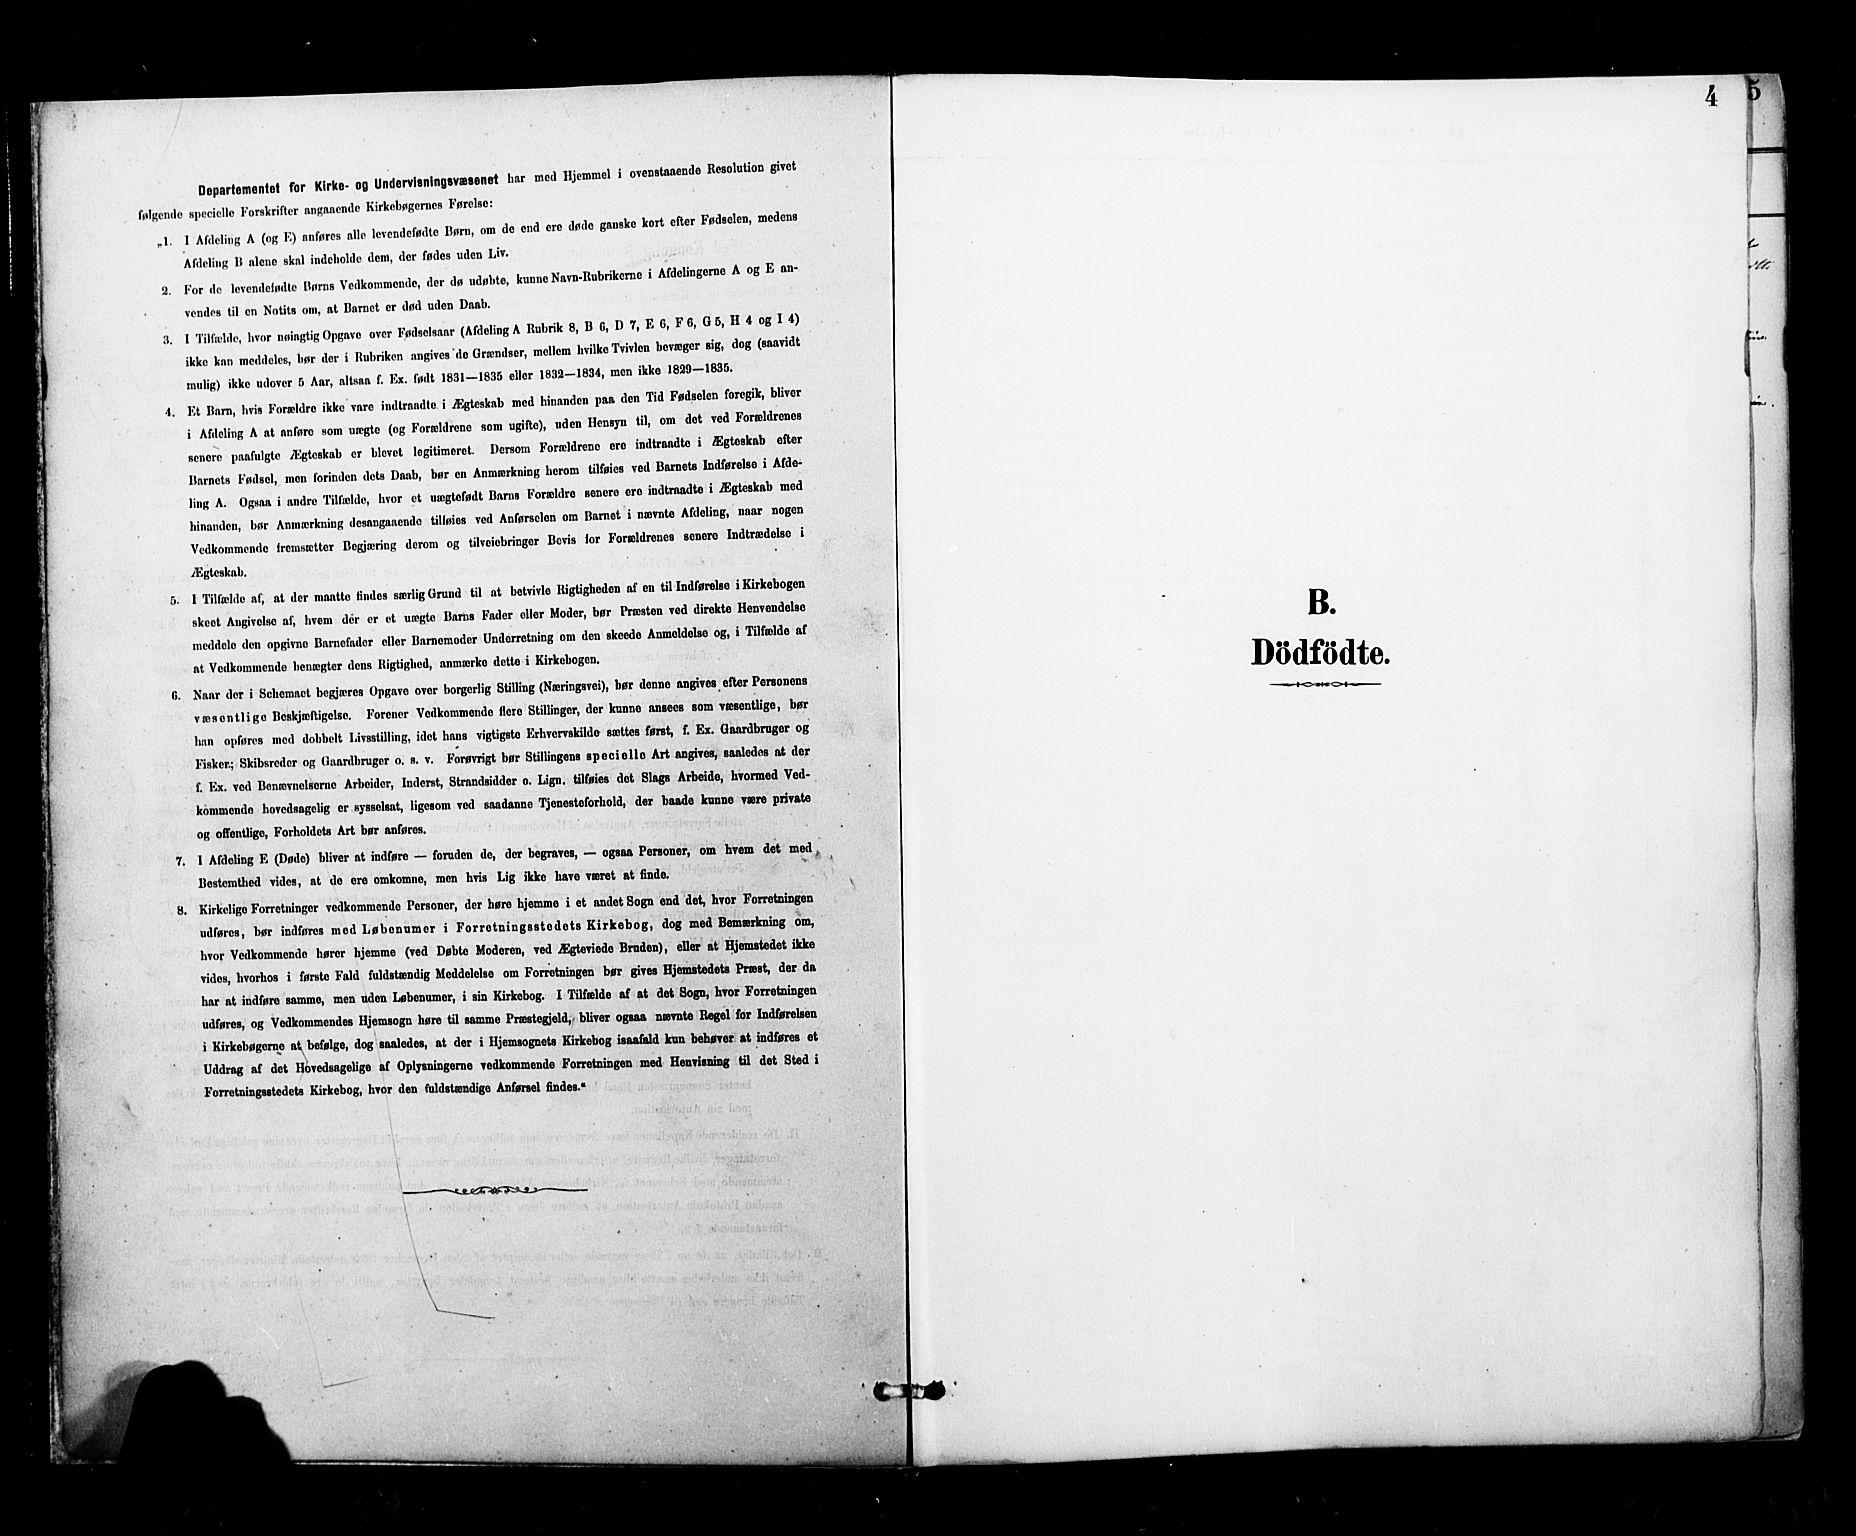 SAT, Ministerialprotokoller, klokkerbøker og fødselsregistre - Nordland, 827/L0401: Ministerialbok nr. 827A13, 1887-1905, s. 4